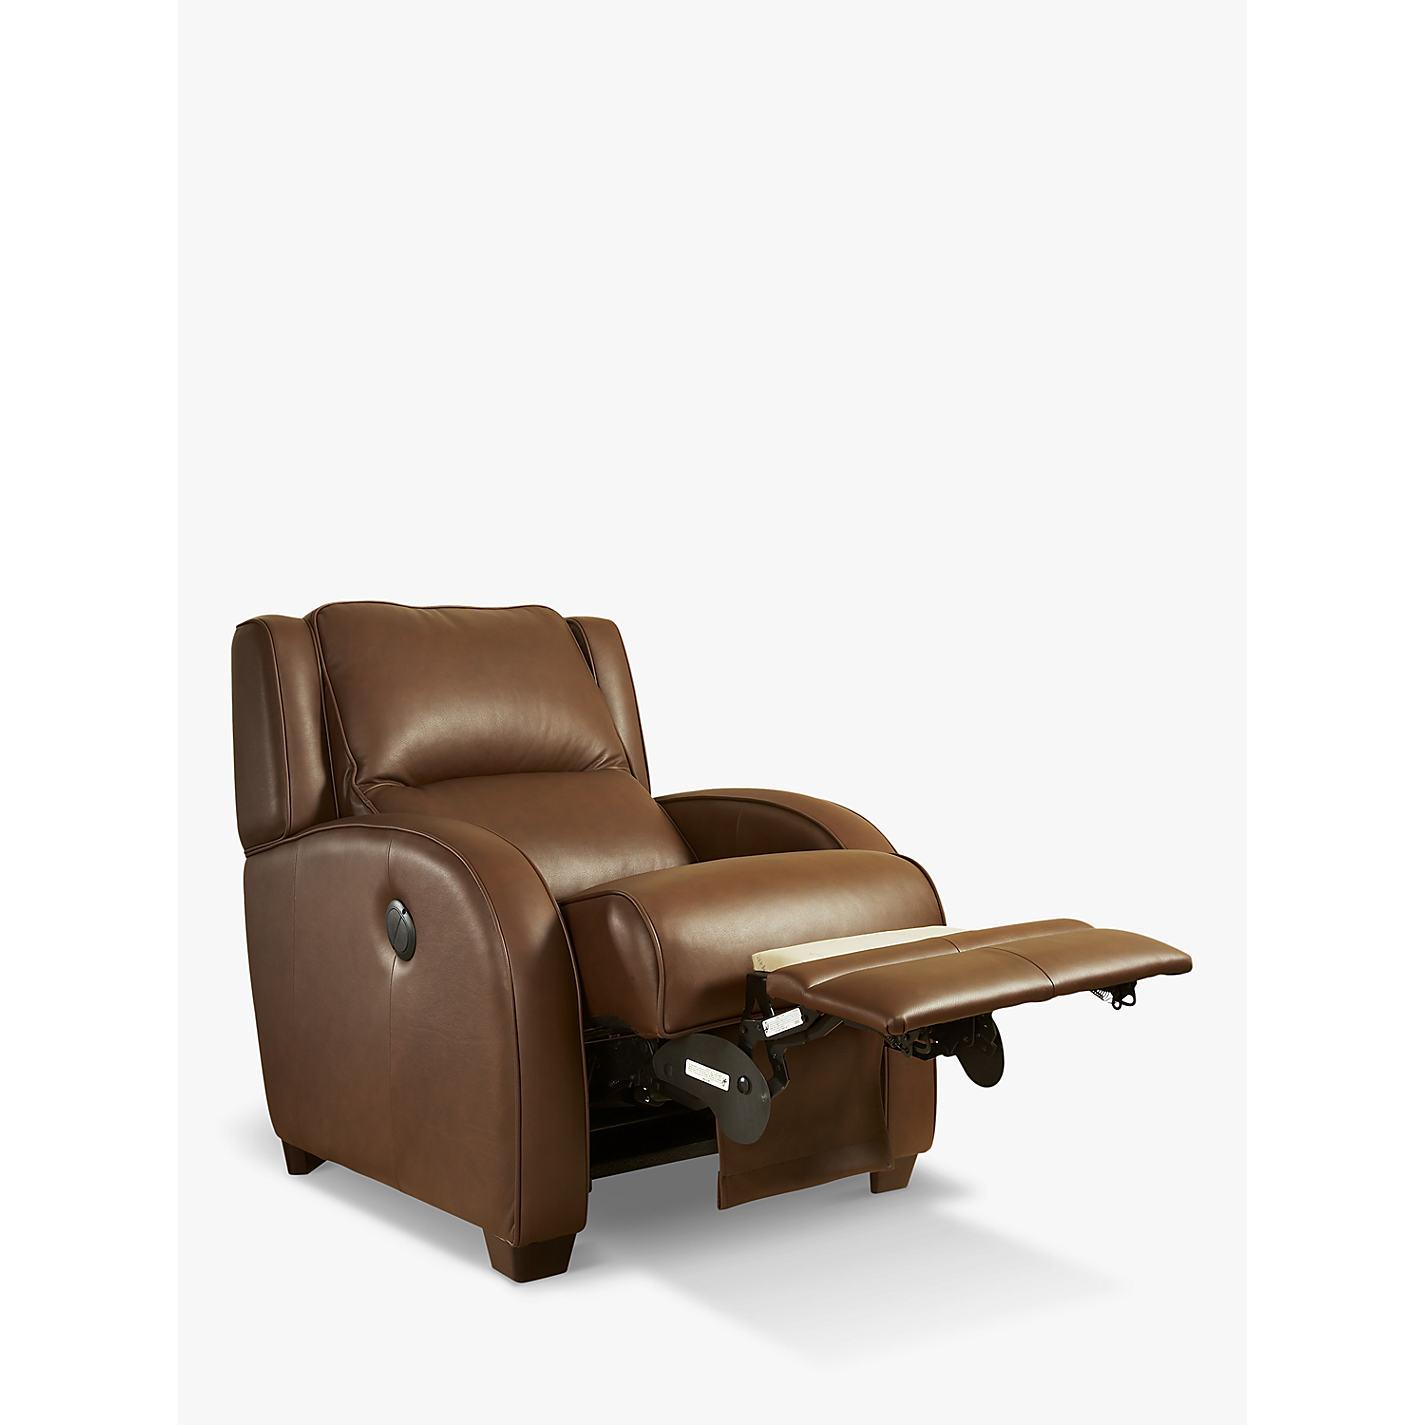 ... Buy Parker Knoll Charleston Power Recliner Leather Armchair Como Oak Online at johnlewis.com ...  sc 1 st  John Lewis & Buy Parker Knoll Charleston Power Recliner Leather Armchair Como ... islam-shia.org